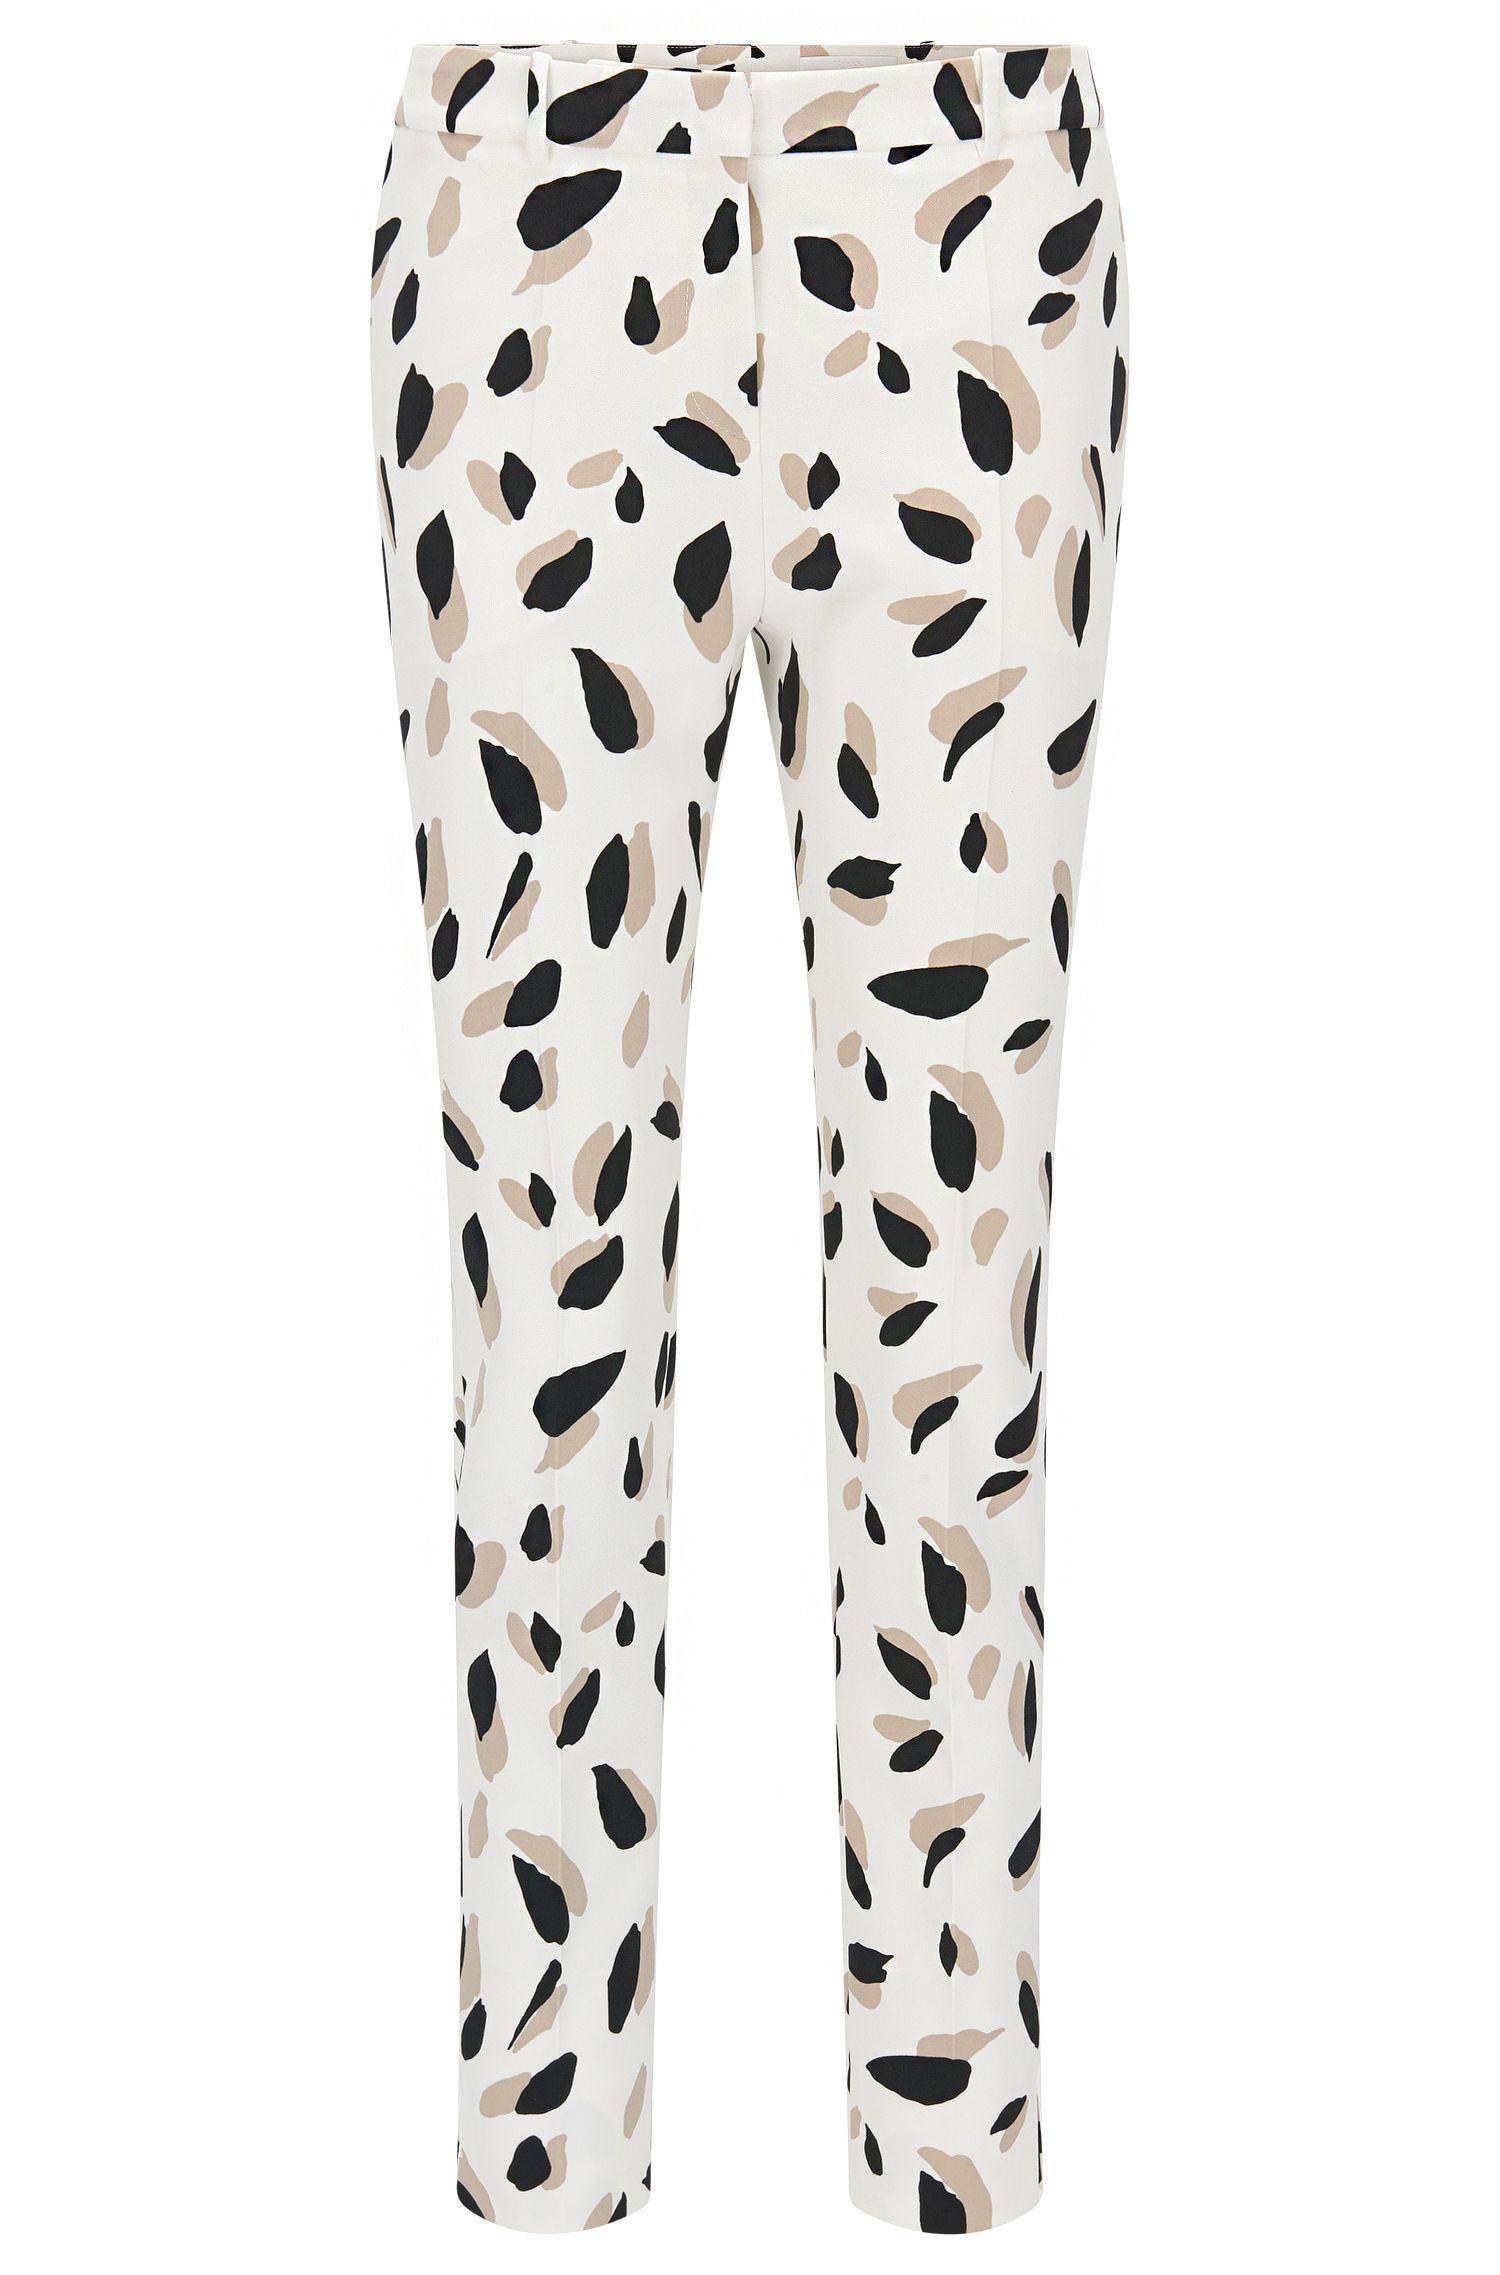 'Timera' | Slim Fit, Printed Stretch Trousers